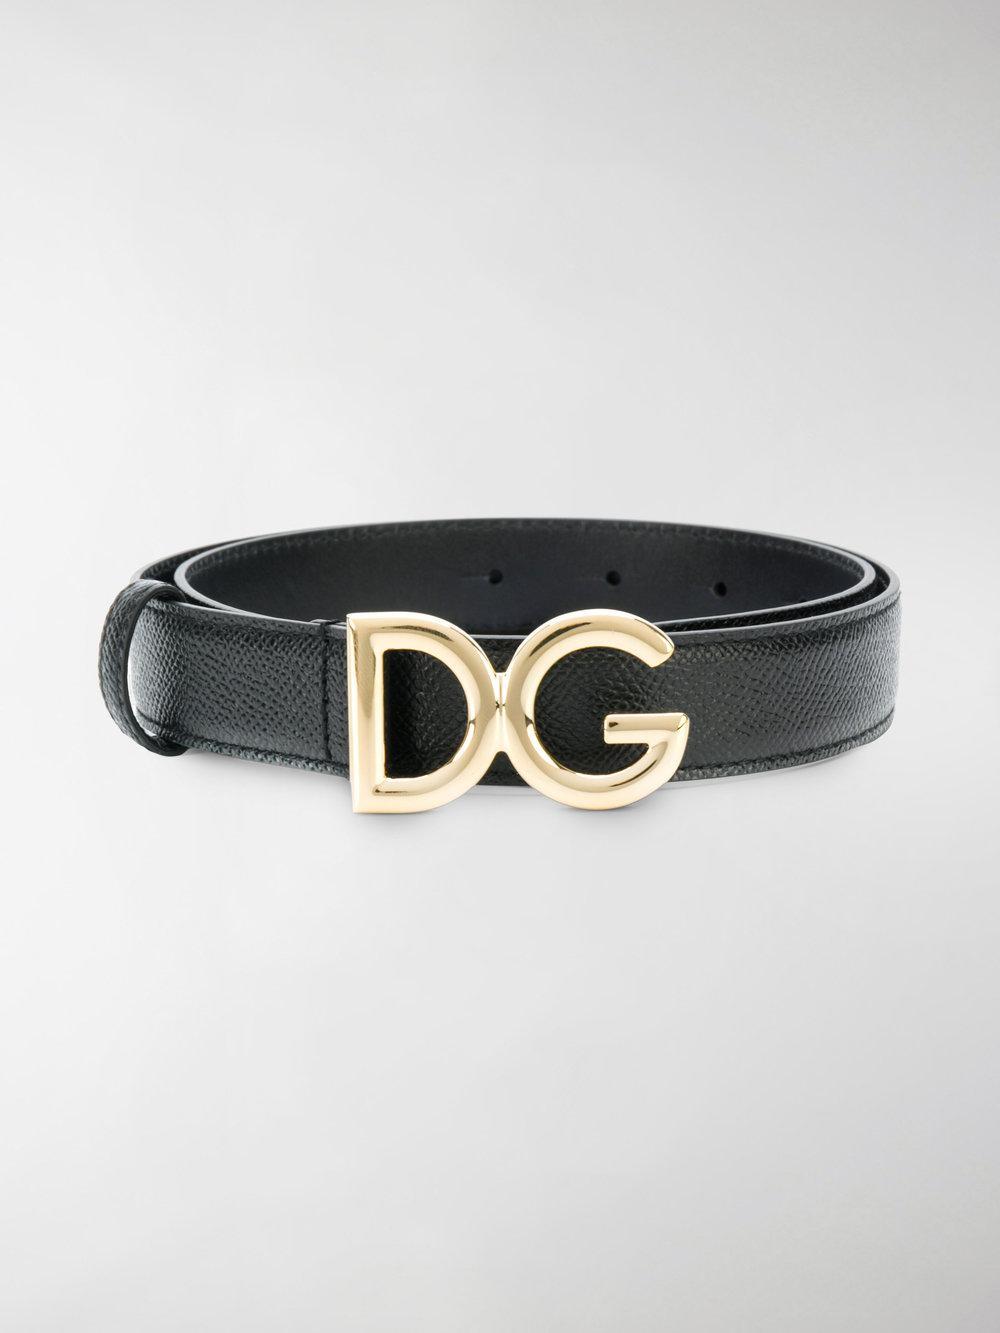 Cheapest Cheap Price Dolce & Gabbana DG logo buckle belt Buy Cheap 2018 k6sB7Zmeww